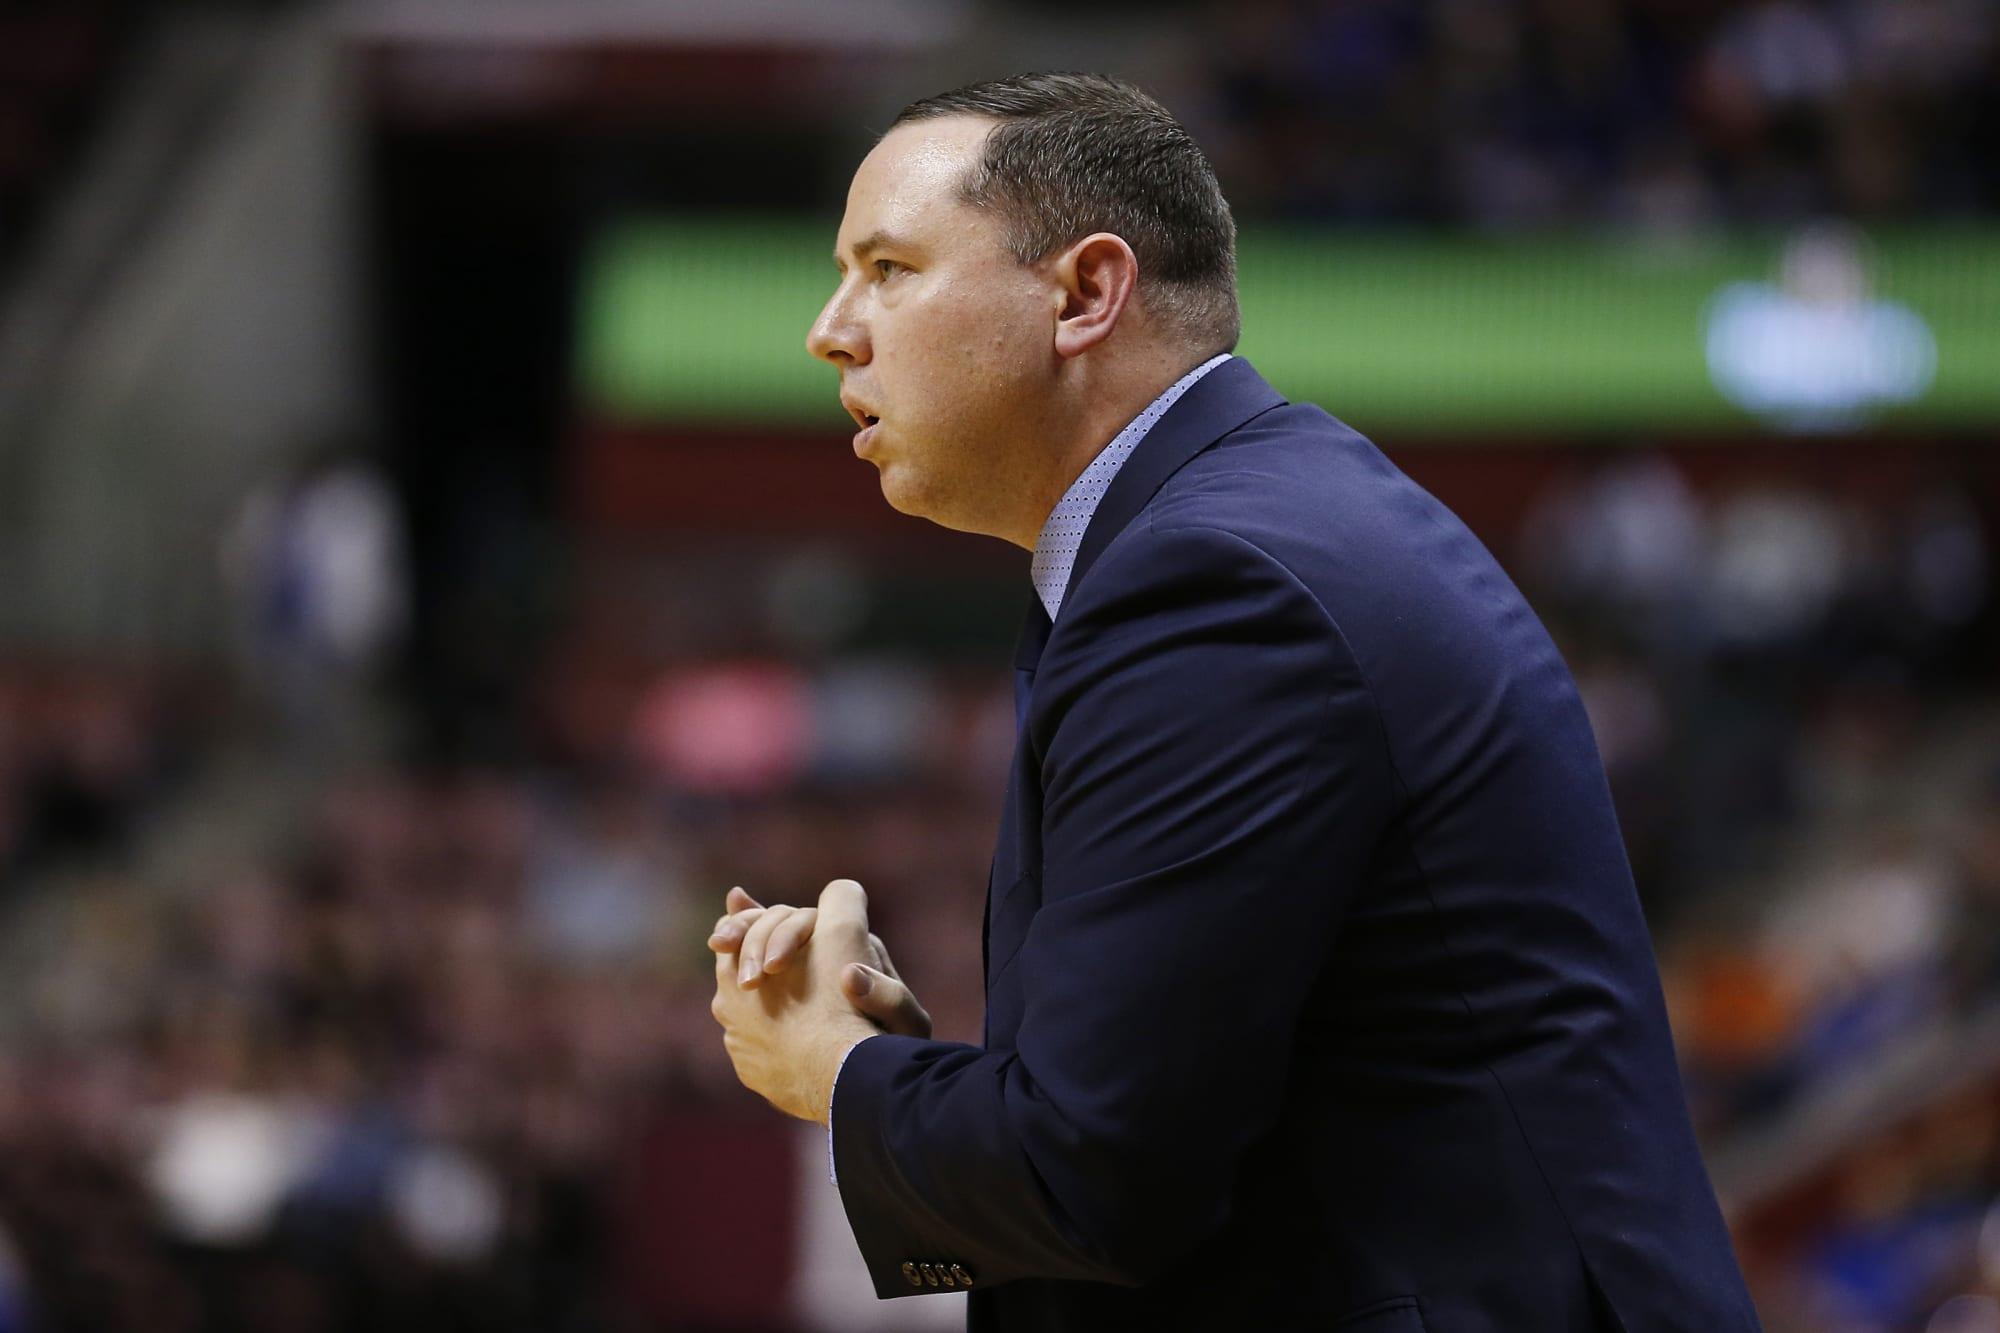 Florida Gulf Coast Basketball: 2021-22 season preview for Eagles